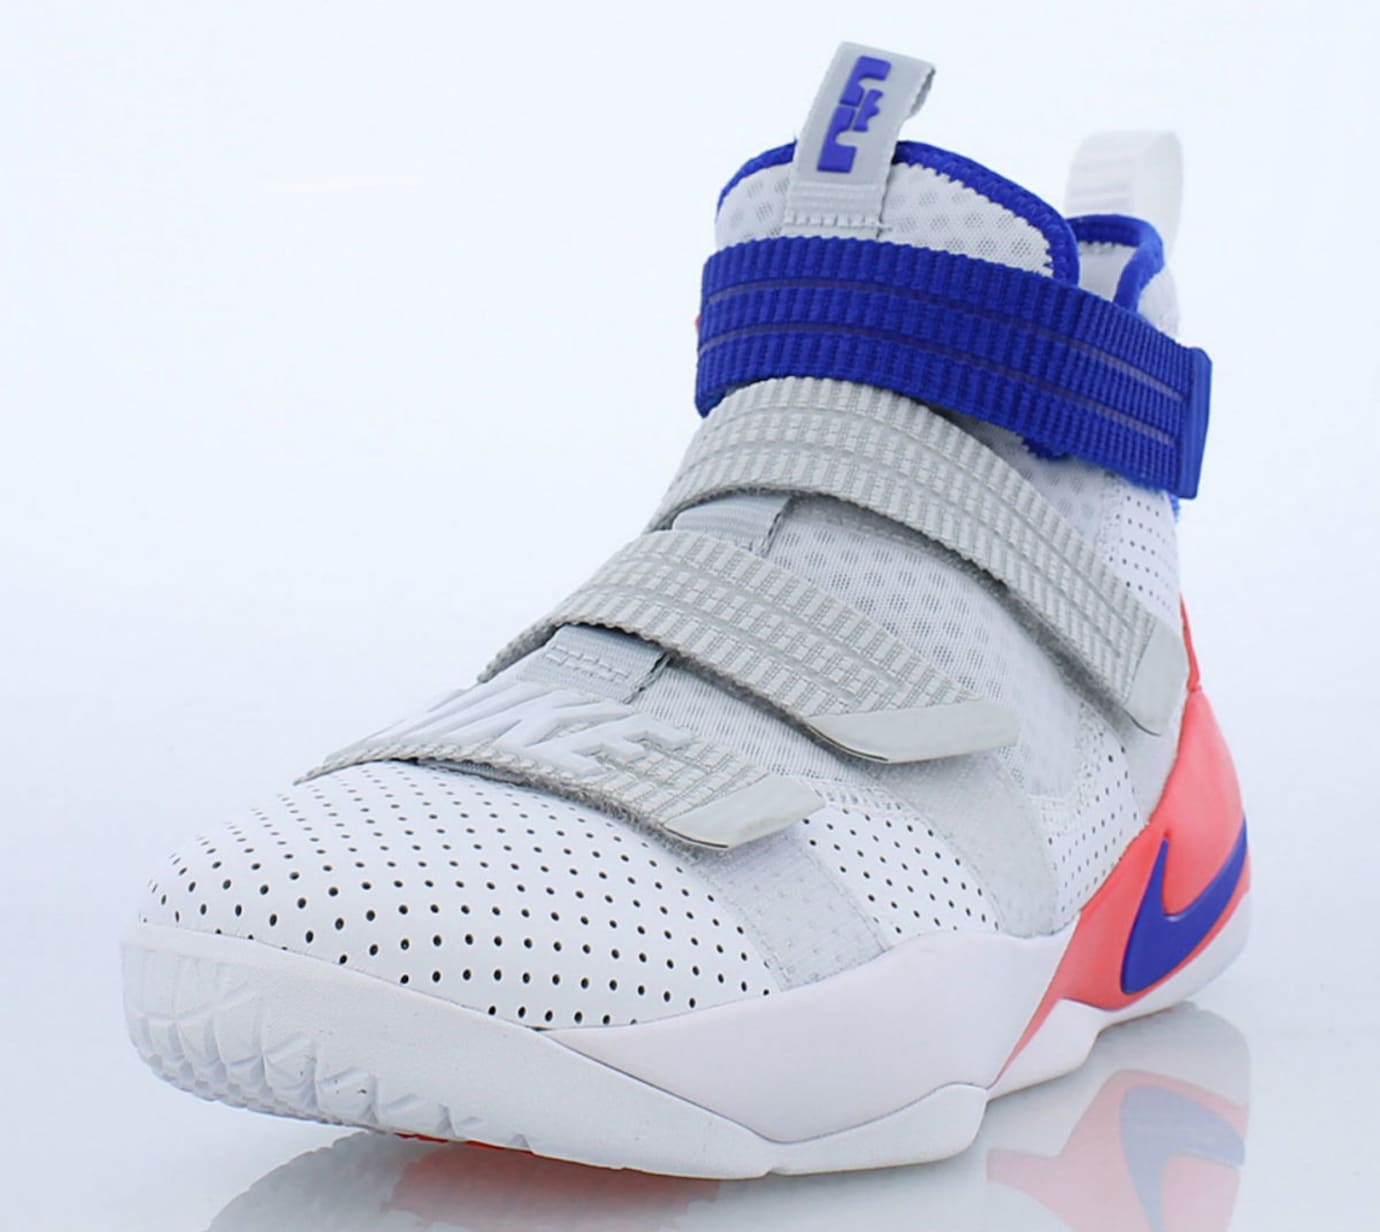 Nike LeBron Soldier 11 Ultramarine Release Date 897646-101